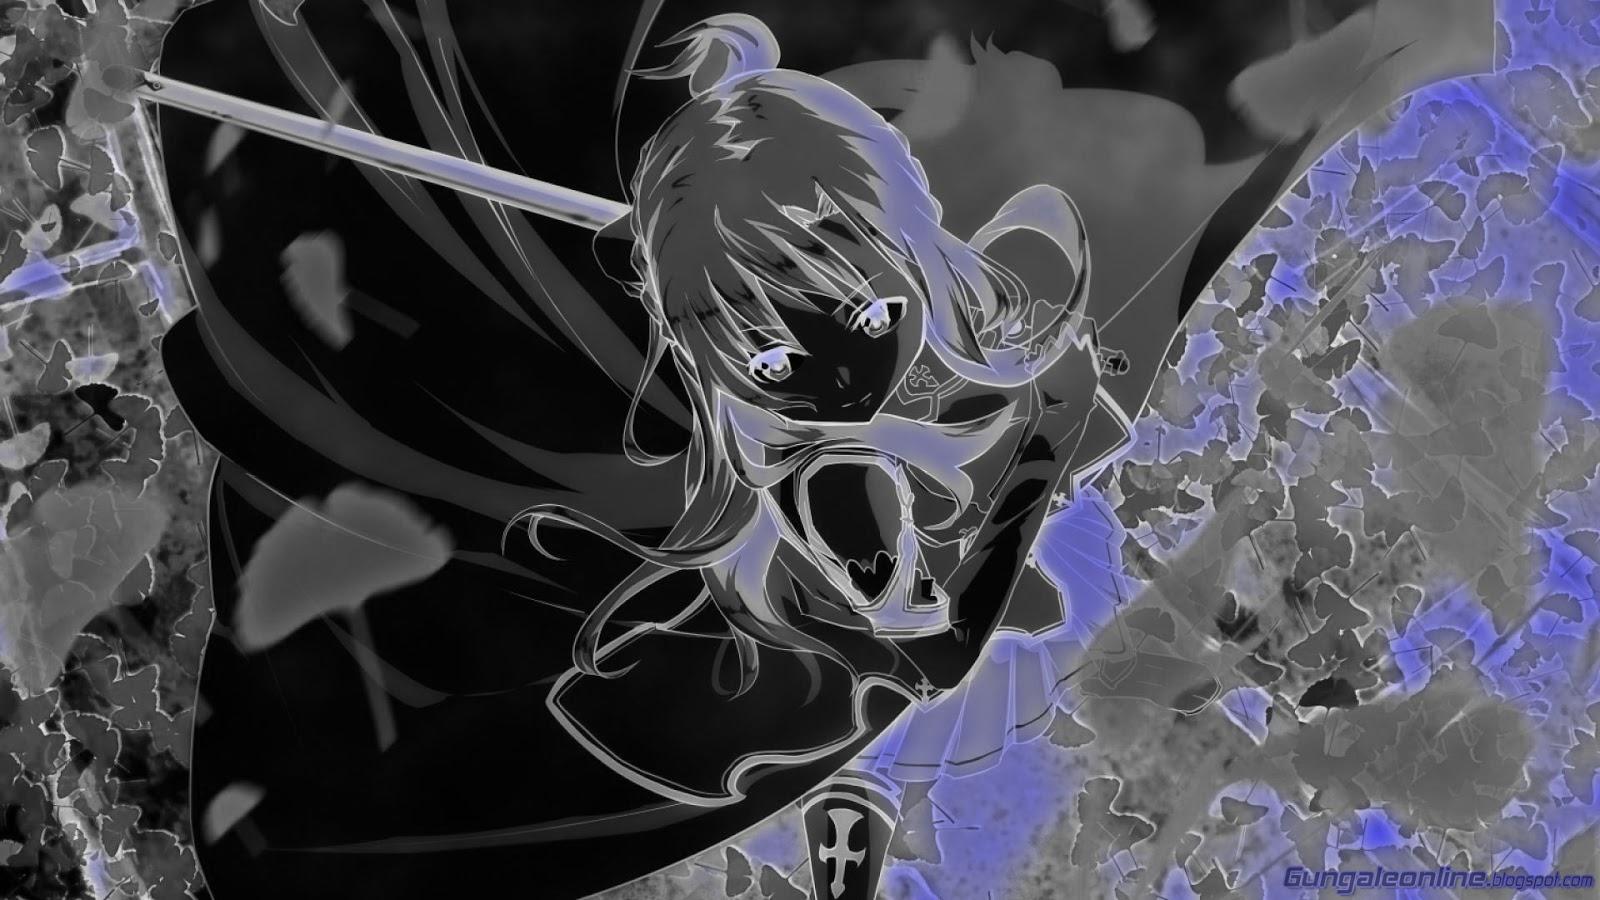 wallpapers Neon Grow Gun Gale Online Anime Mobile Wallpaper HD 1600x900